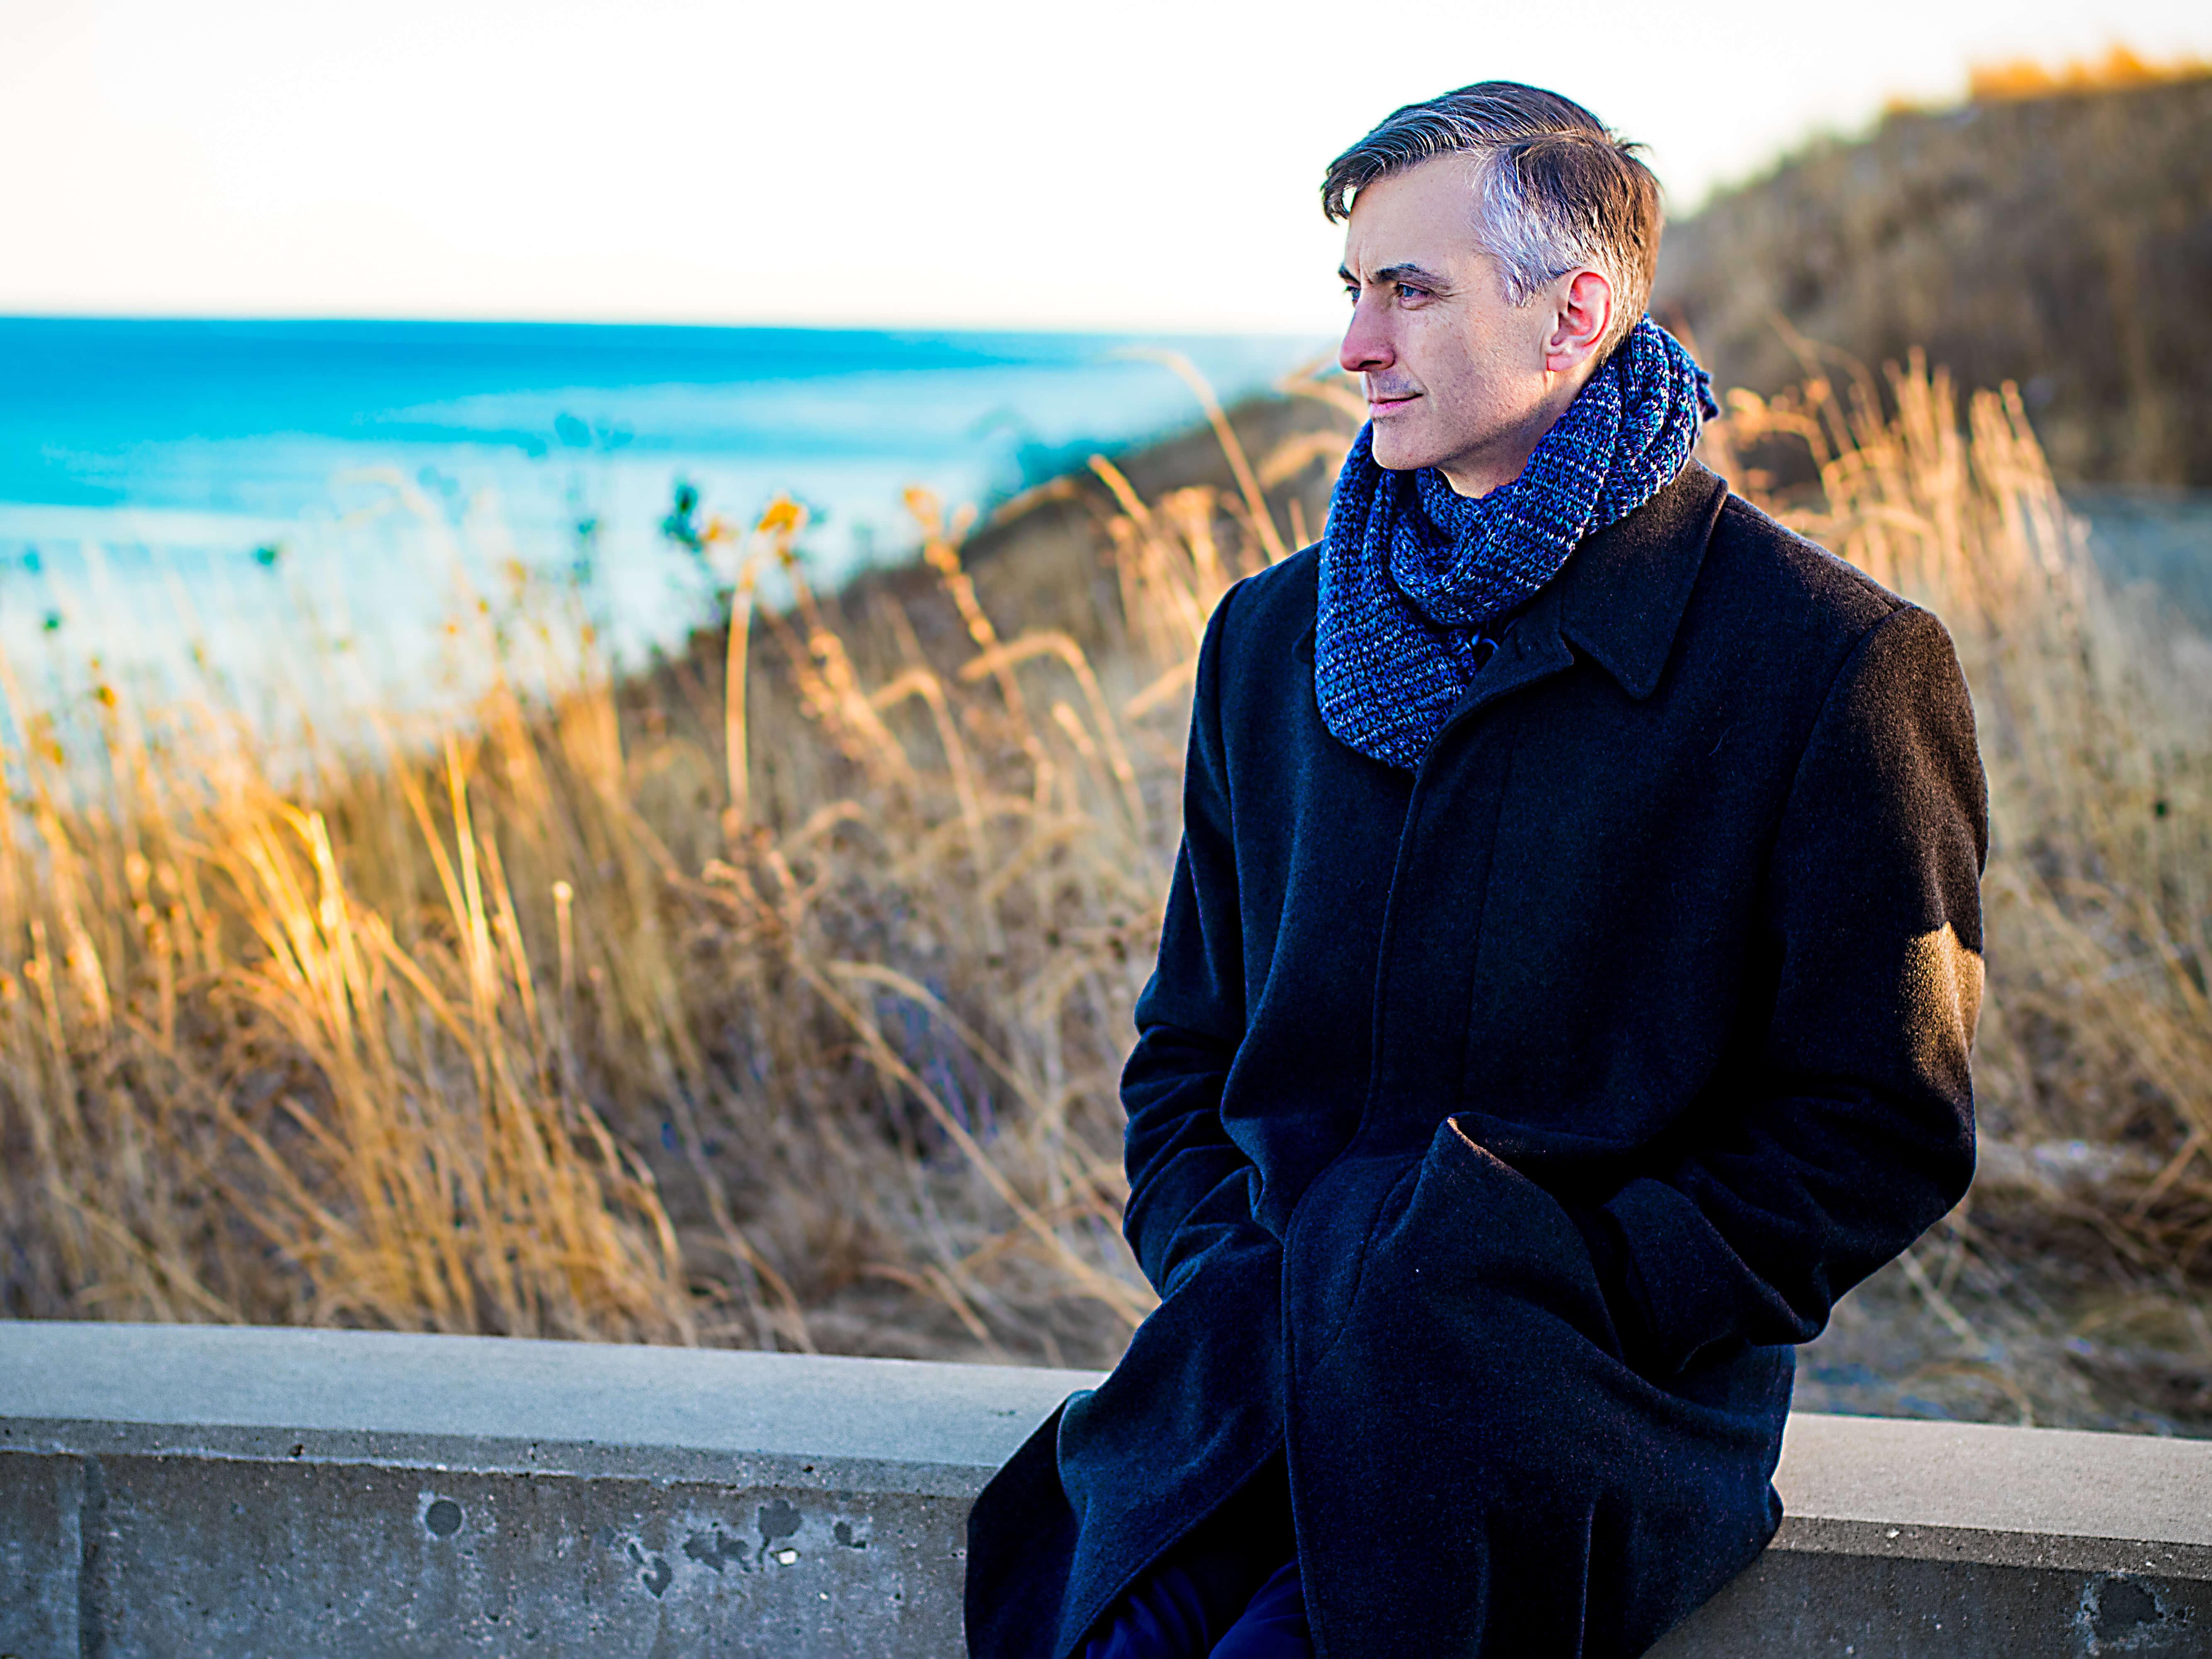 Bernard Bull overlooks Lake Michigan and contemplates Concordia's mission.